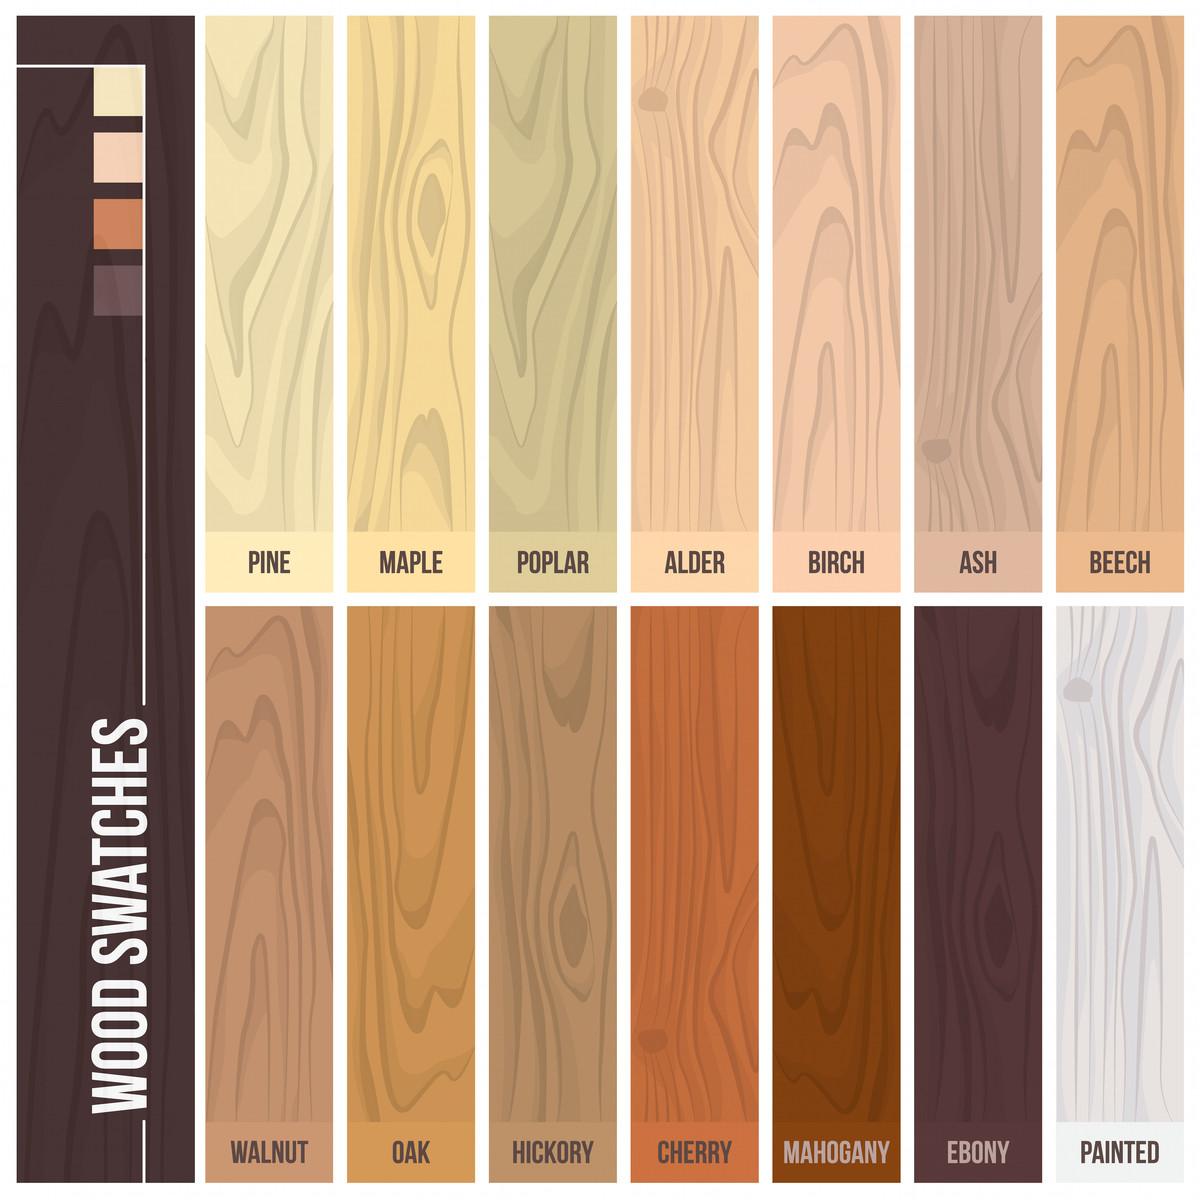 maple vs hickory hardwood floors of 12 types of hardwood flooring species styles edging dimensions in types of hardwood flooring illustrated guide